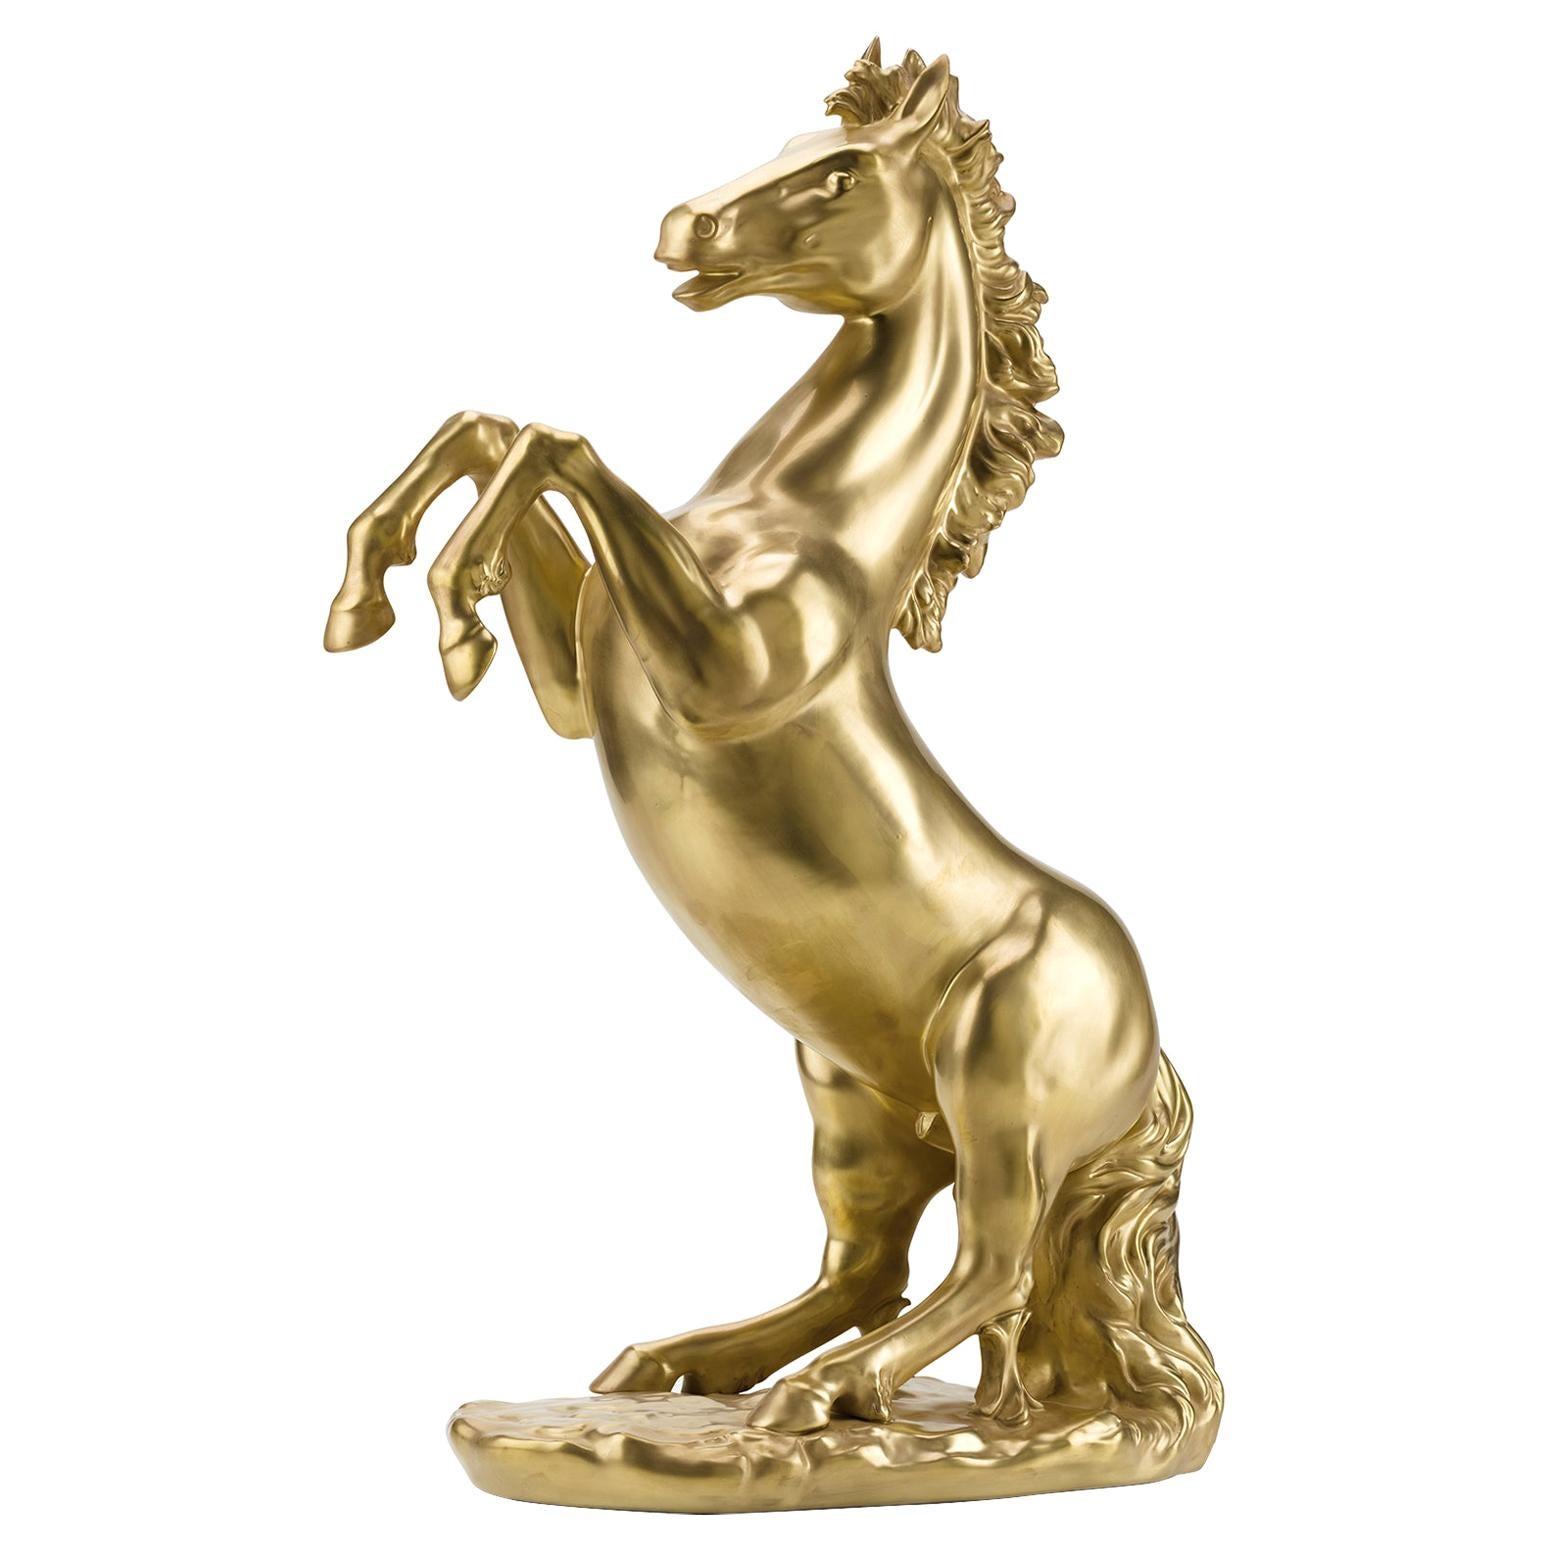 Prancing Stallion Sculpture